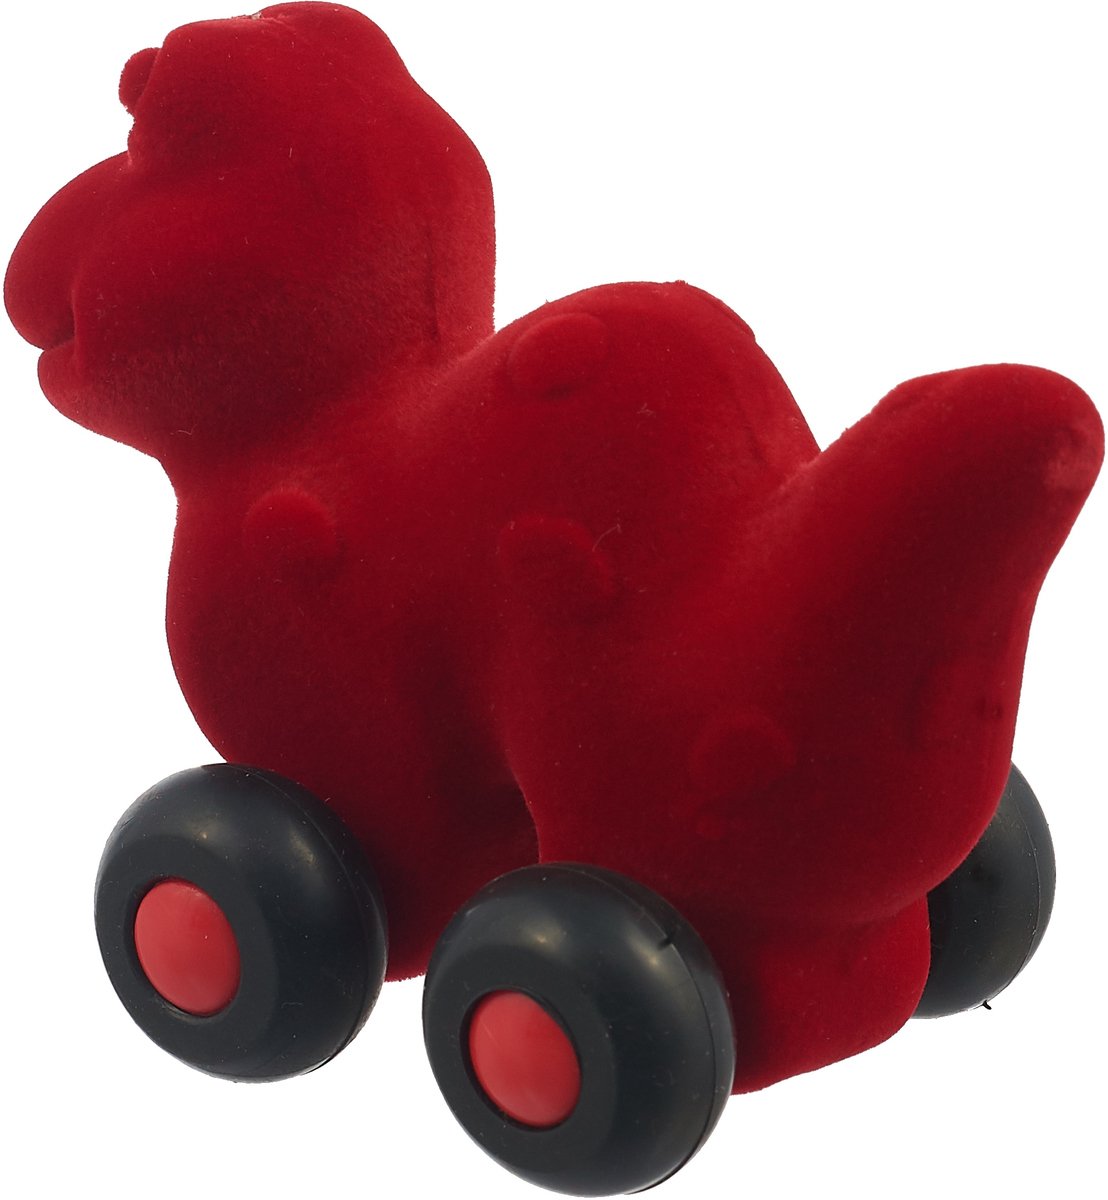 RubbabuФигурка функциональная Змея цвет красный цвет красный Rubbabu